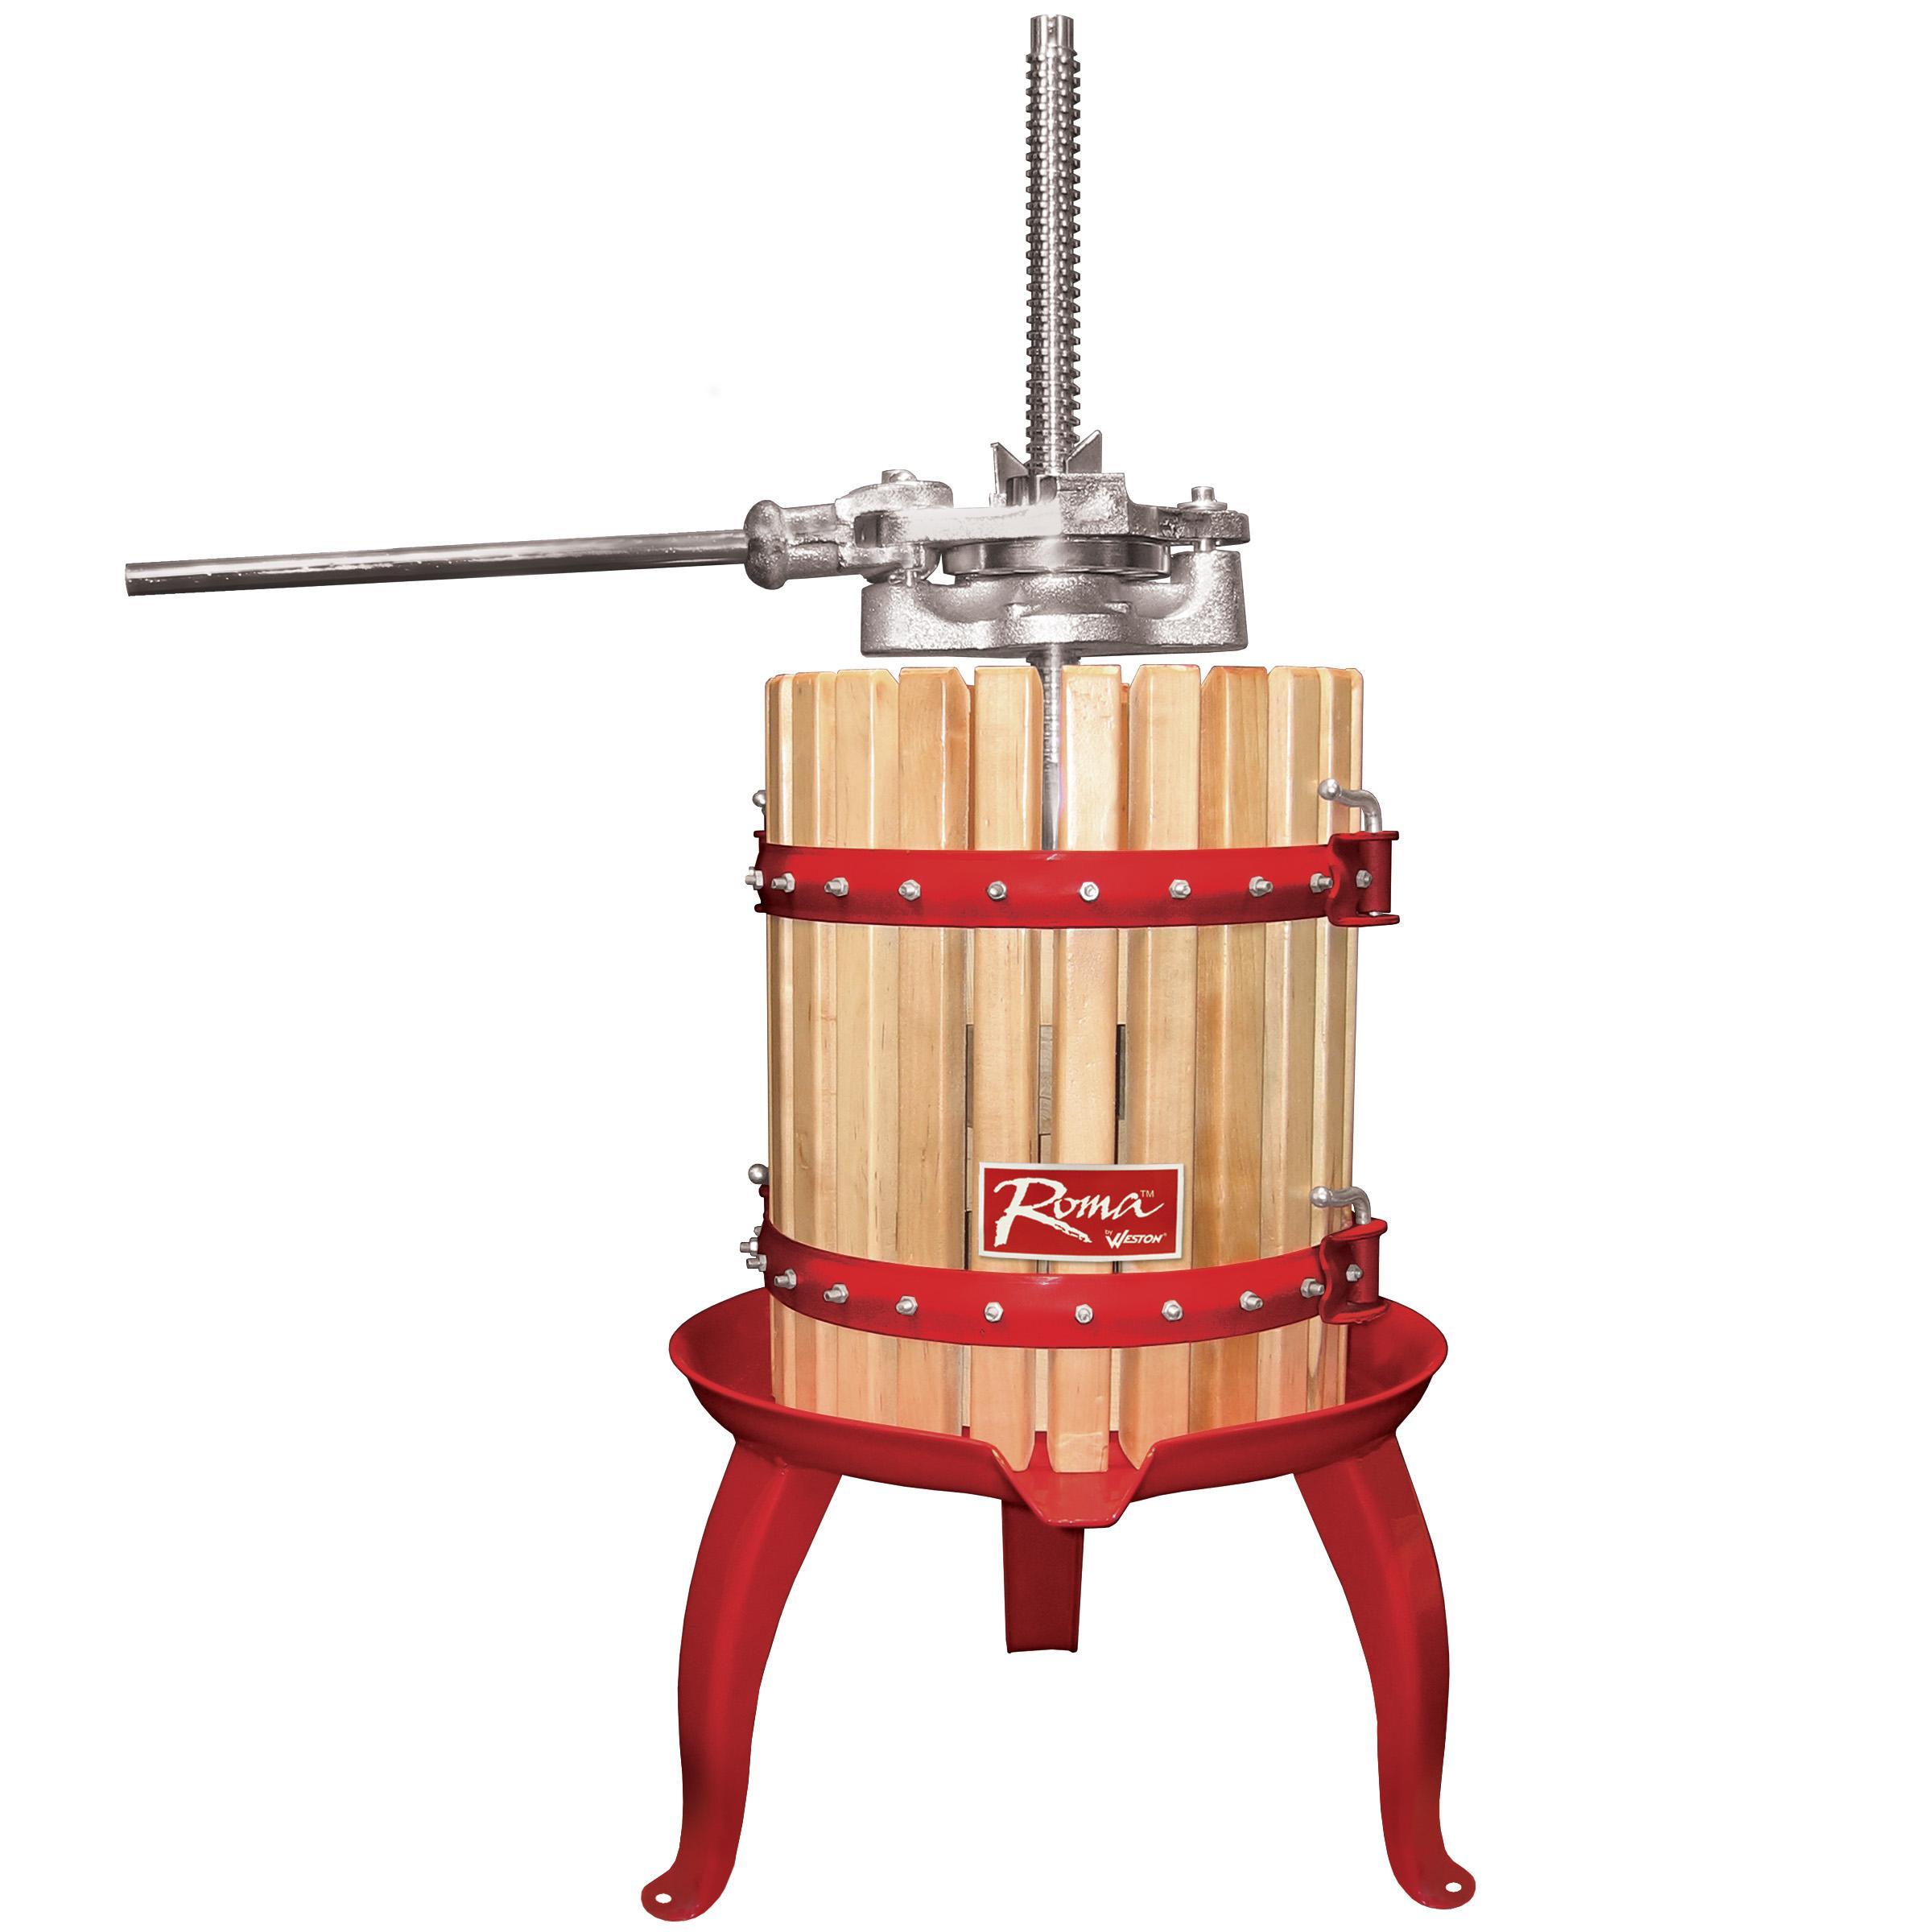 Fruit crusher grape apple crusher grinder for grape apple fruit - Weston Fruit And Wine Press Press Apples